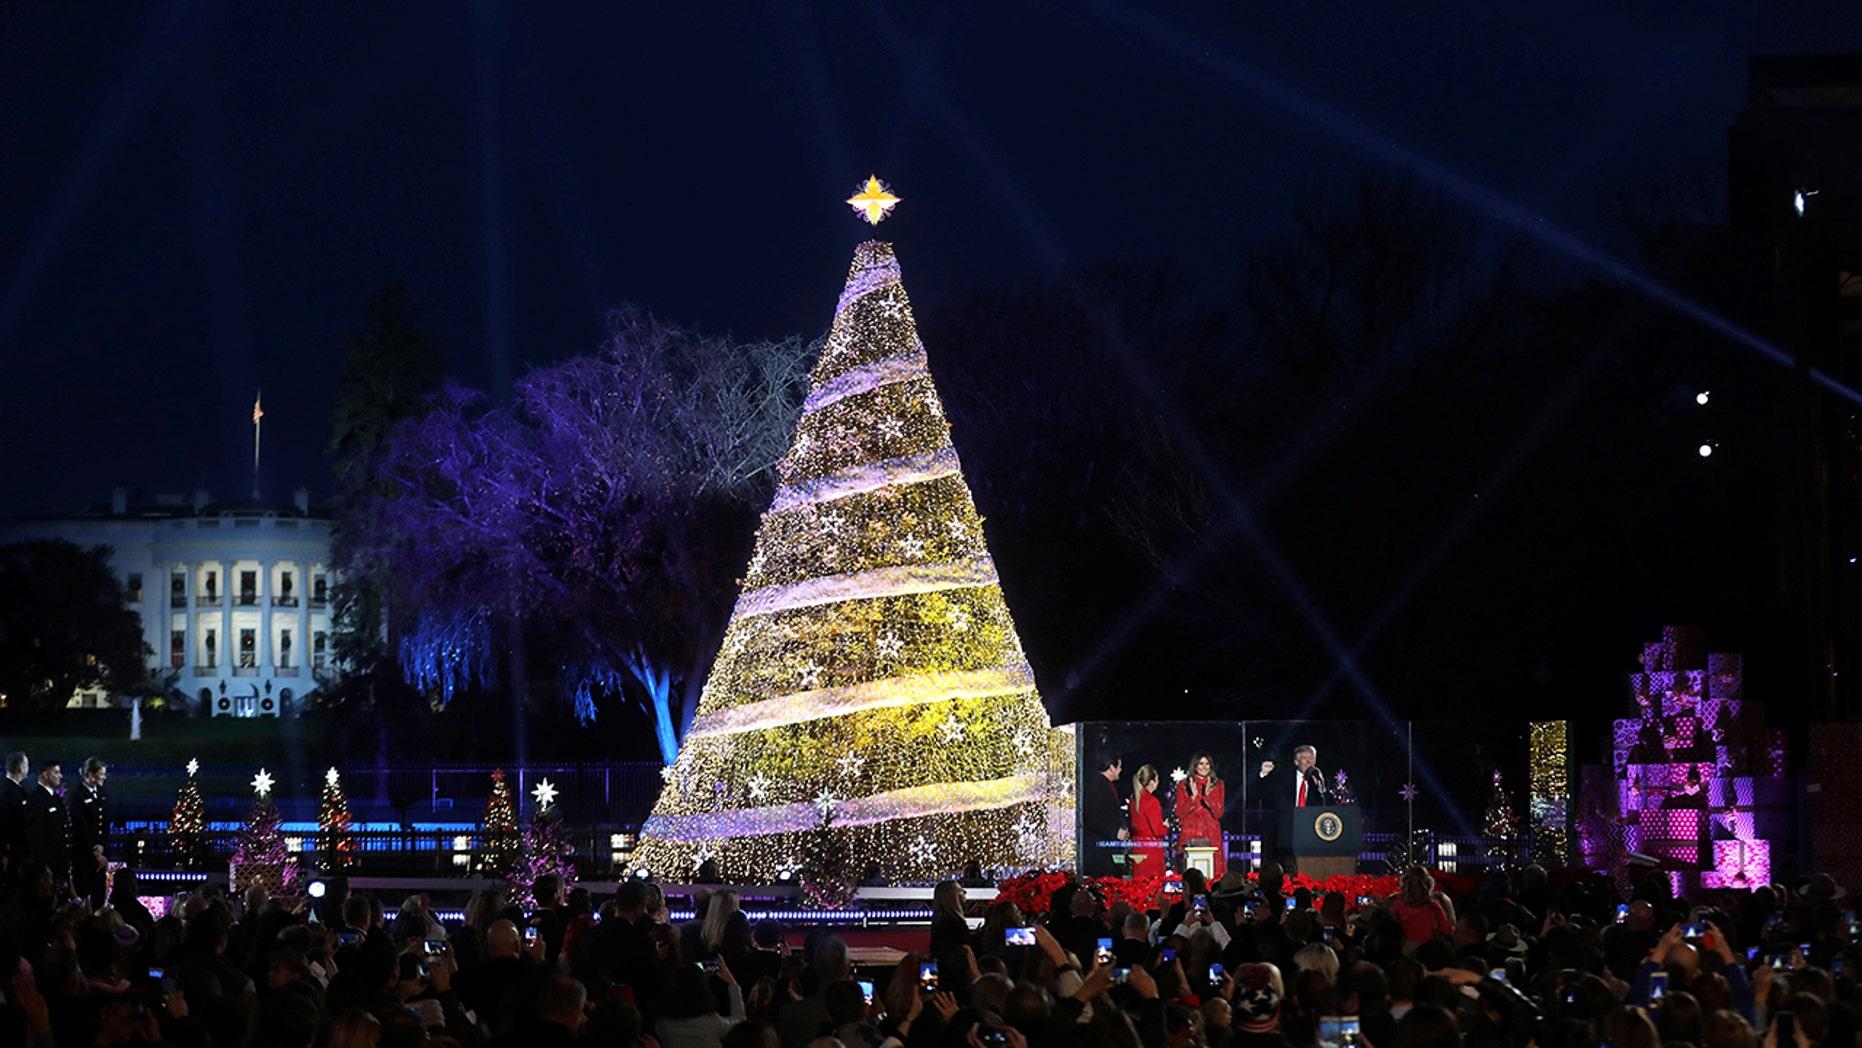 The Christmas tree lighting in Washington, D.C.